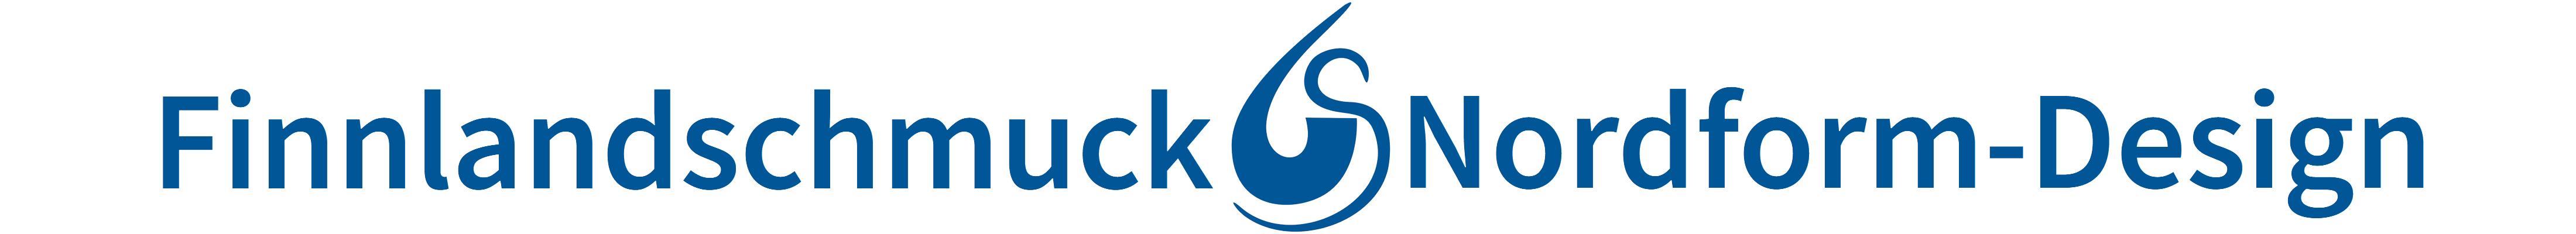 Finnlandschmuck - Nordform-Design